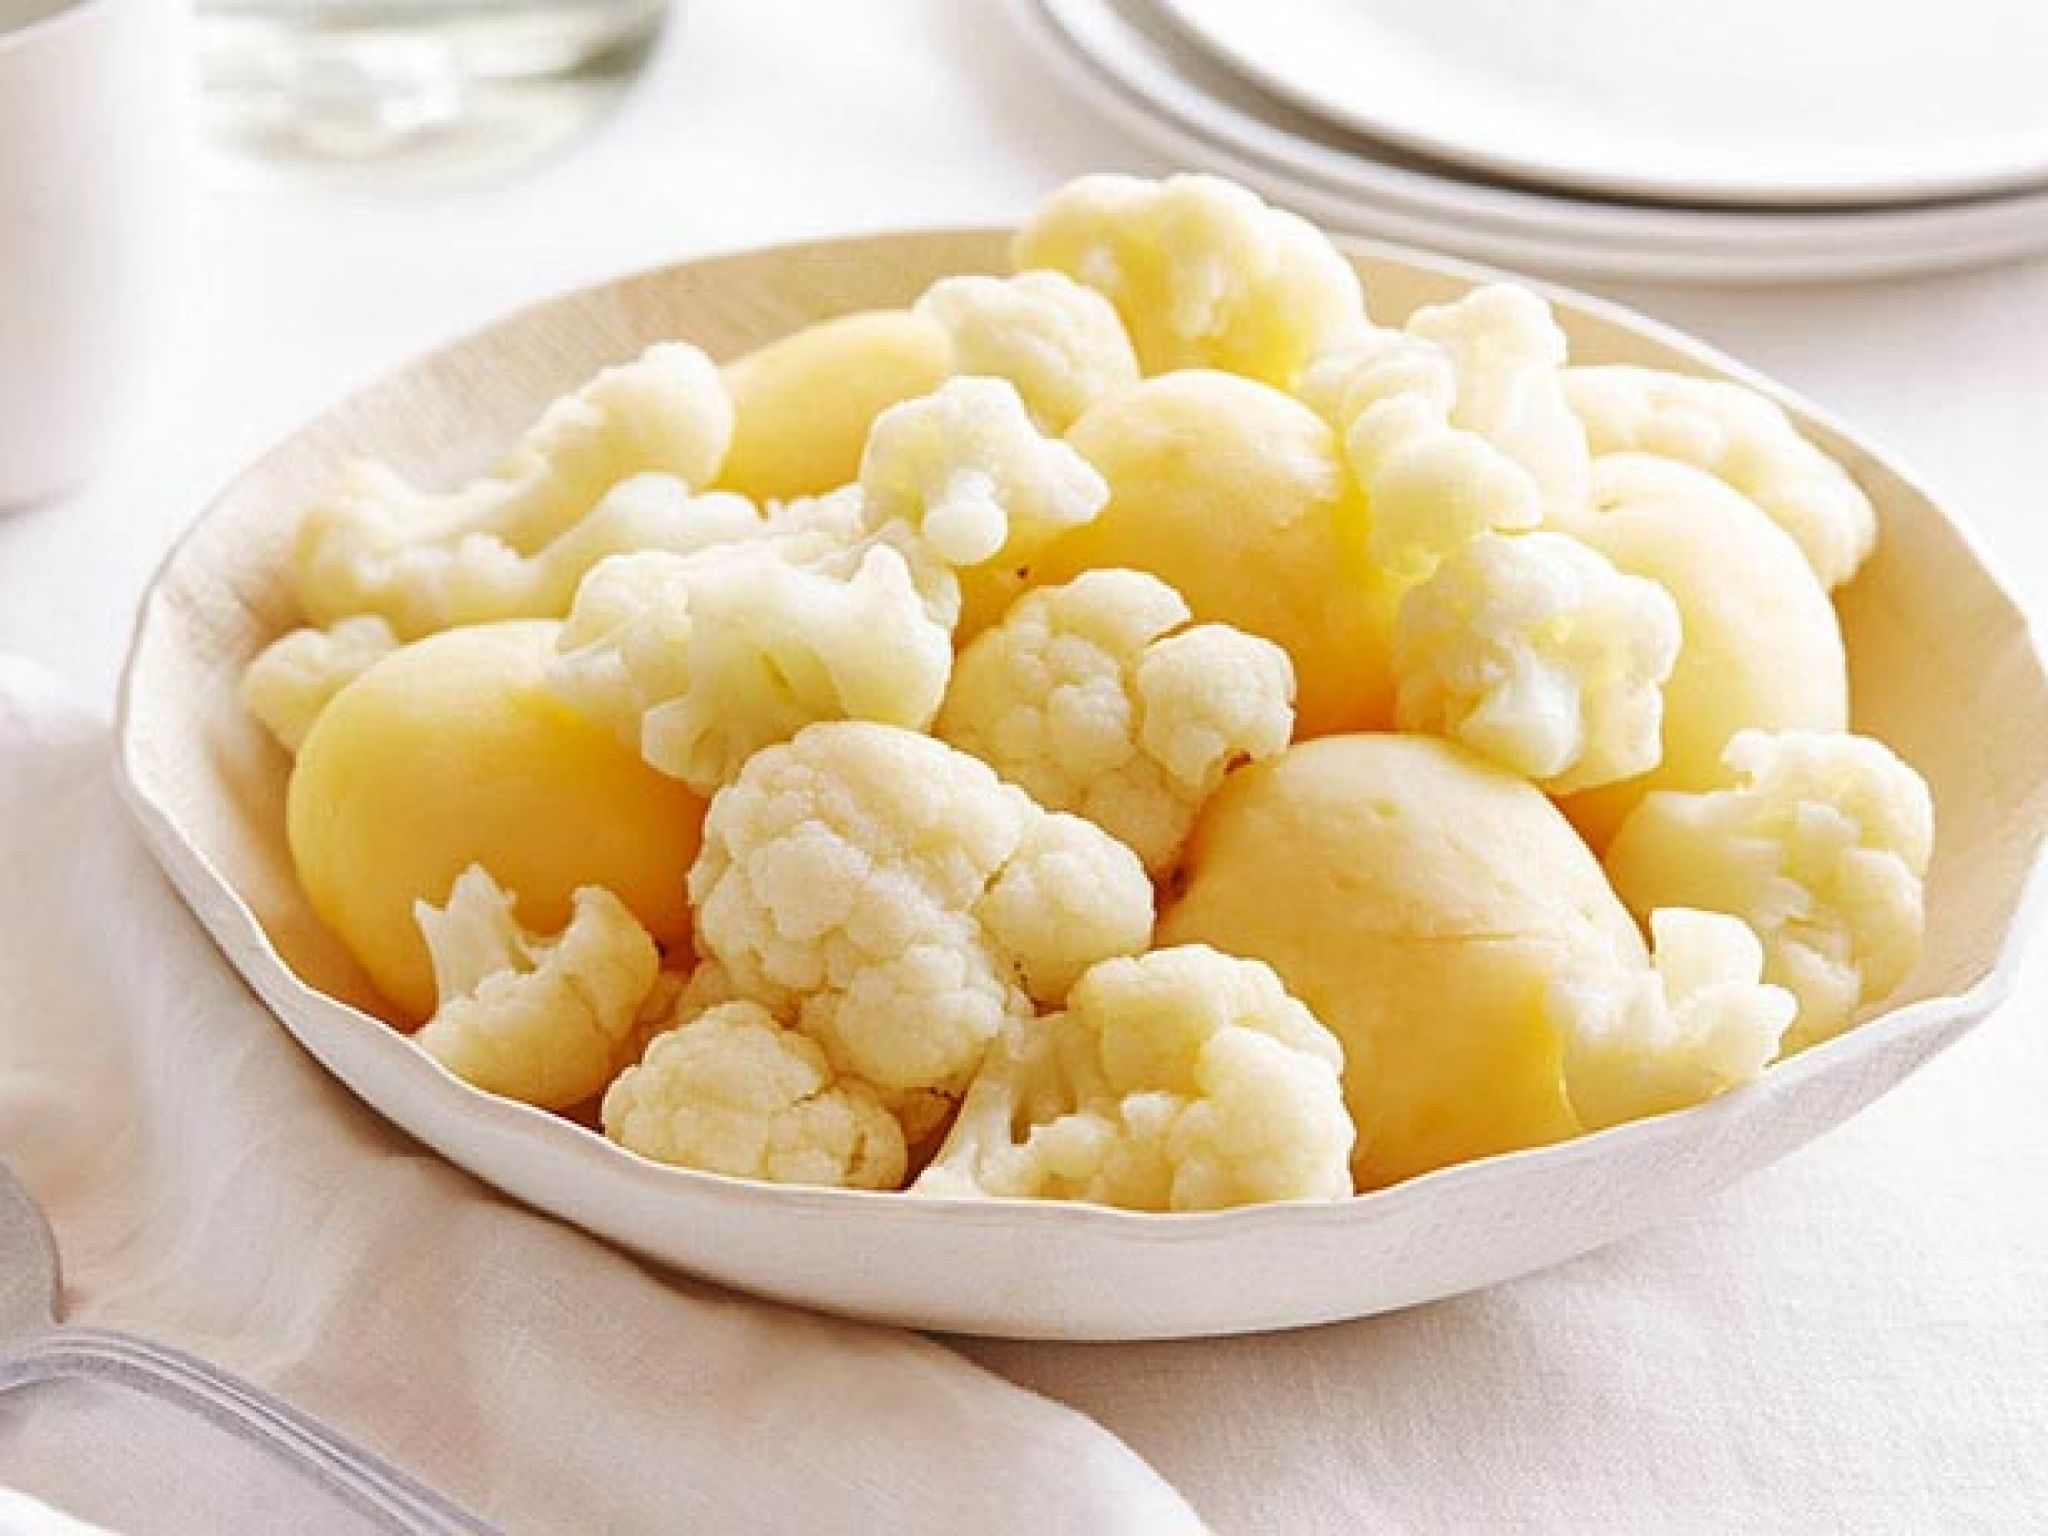 Cauliflower-Potato and Caraway Salad recipe from Food Network Kitchen via Food Network